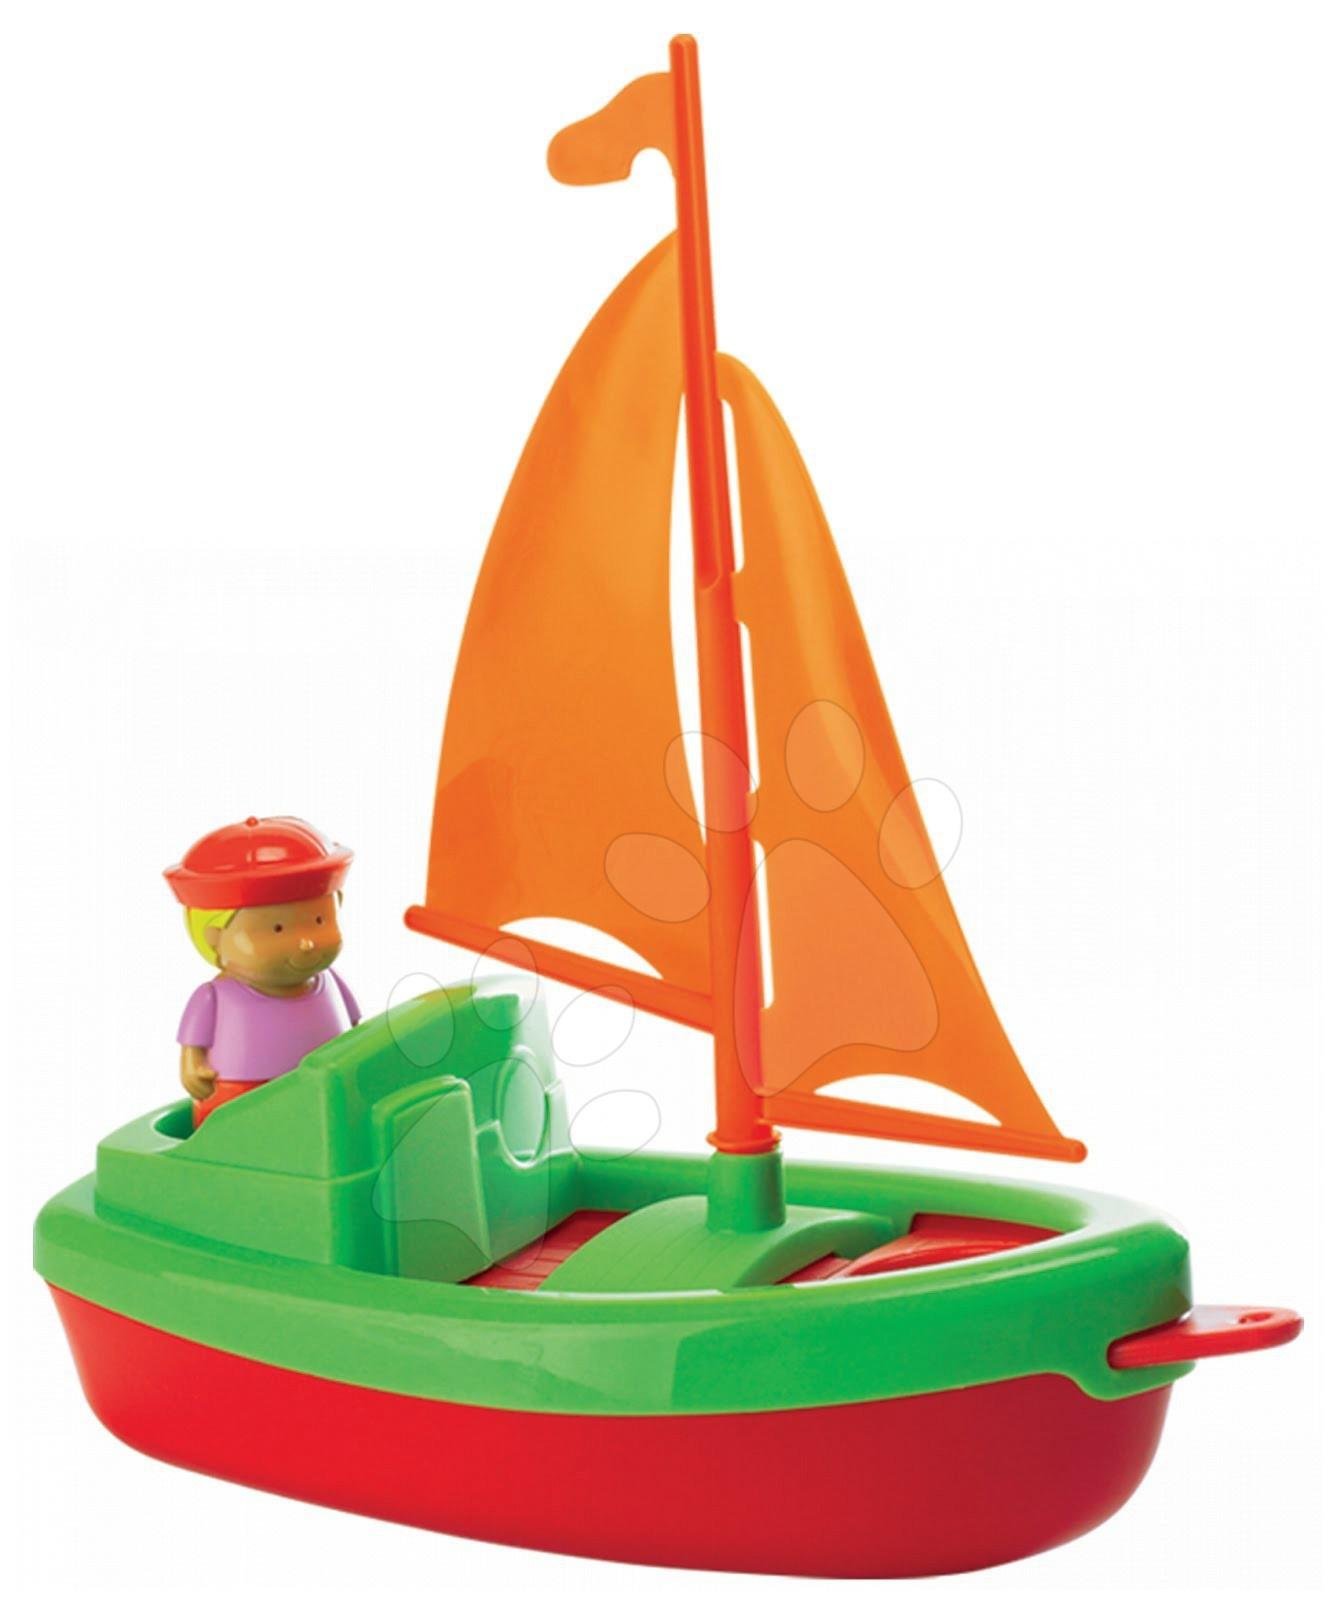 Plachetnica s námorníkom Écoiffier (dĺžka 24,5 cm) červeno-zelená od 18 mes